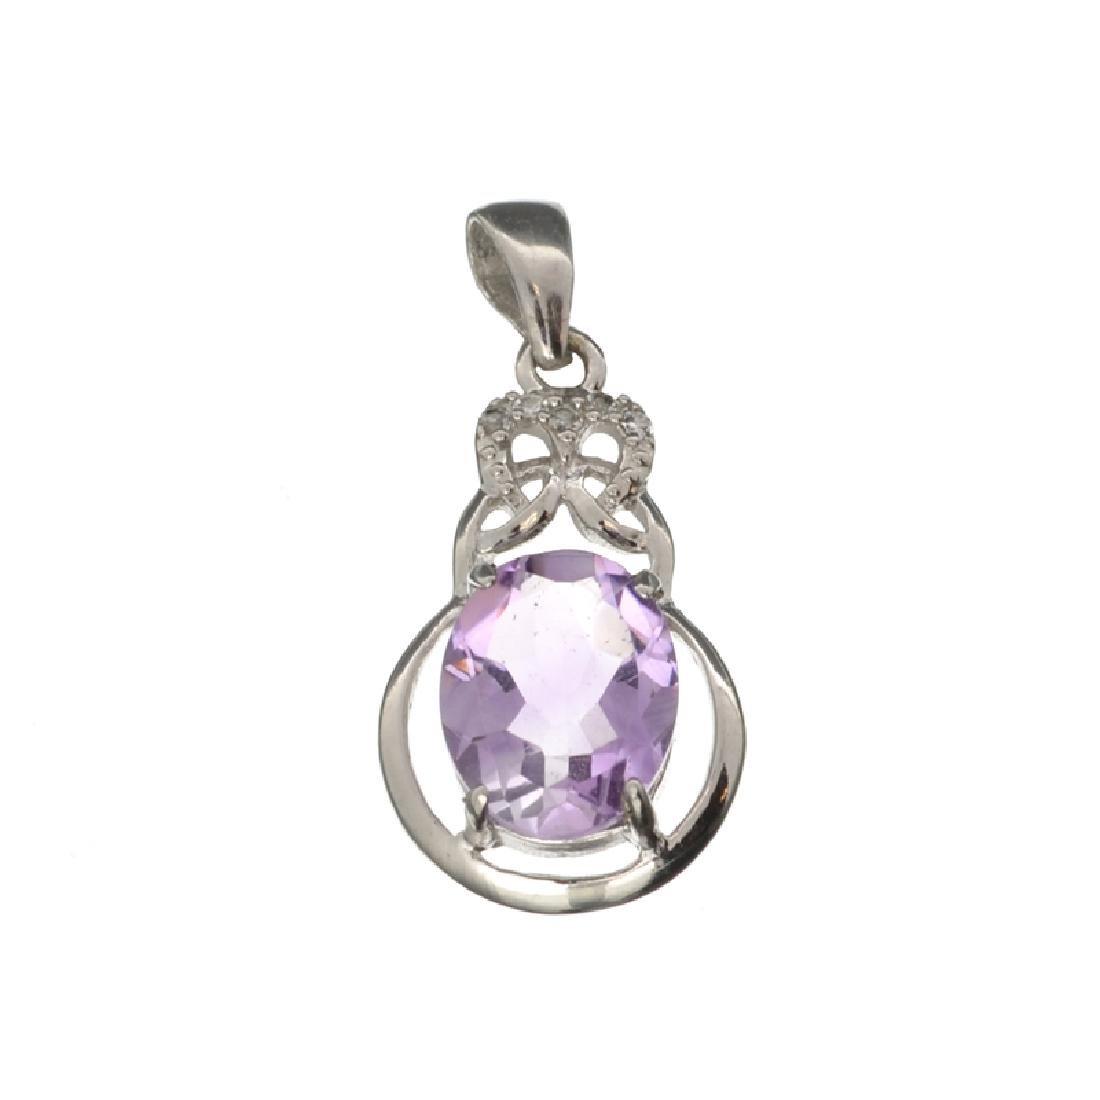 APP: 0.3k Fine Jewelry 2.18CT Purple Amethyst And White